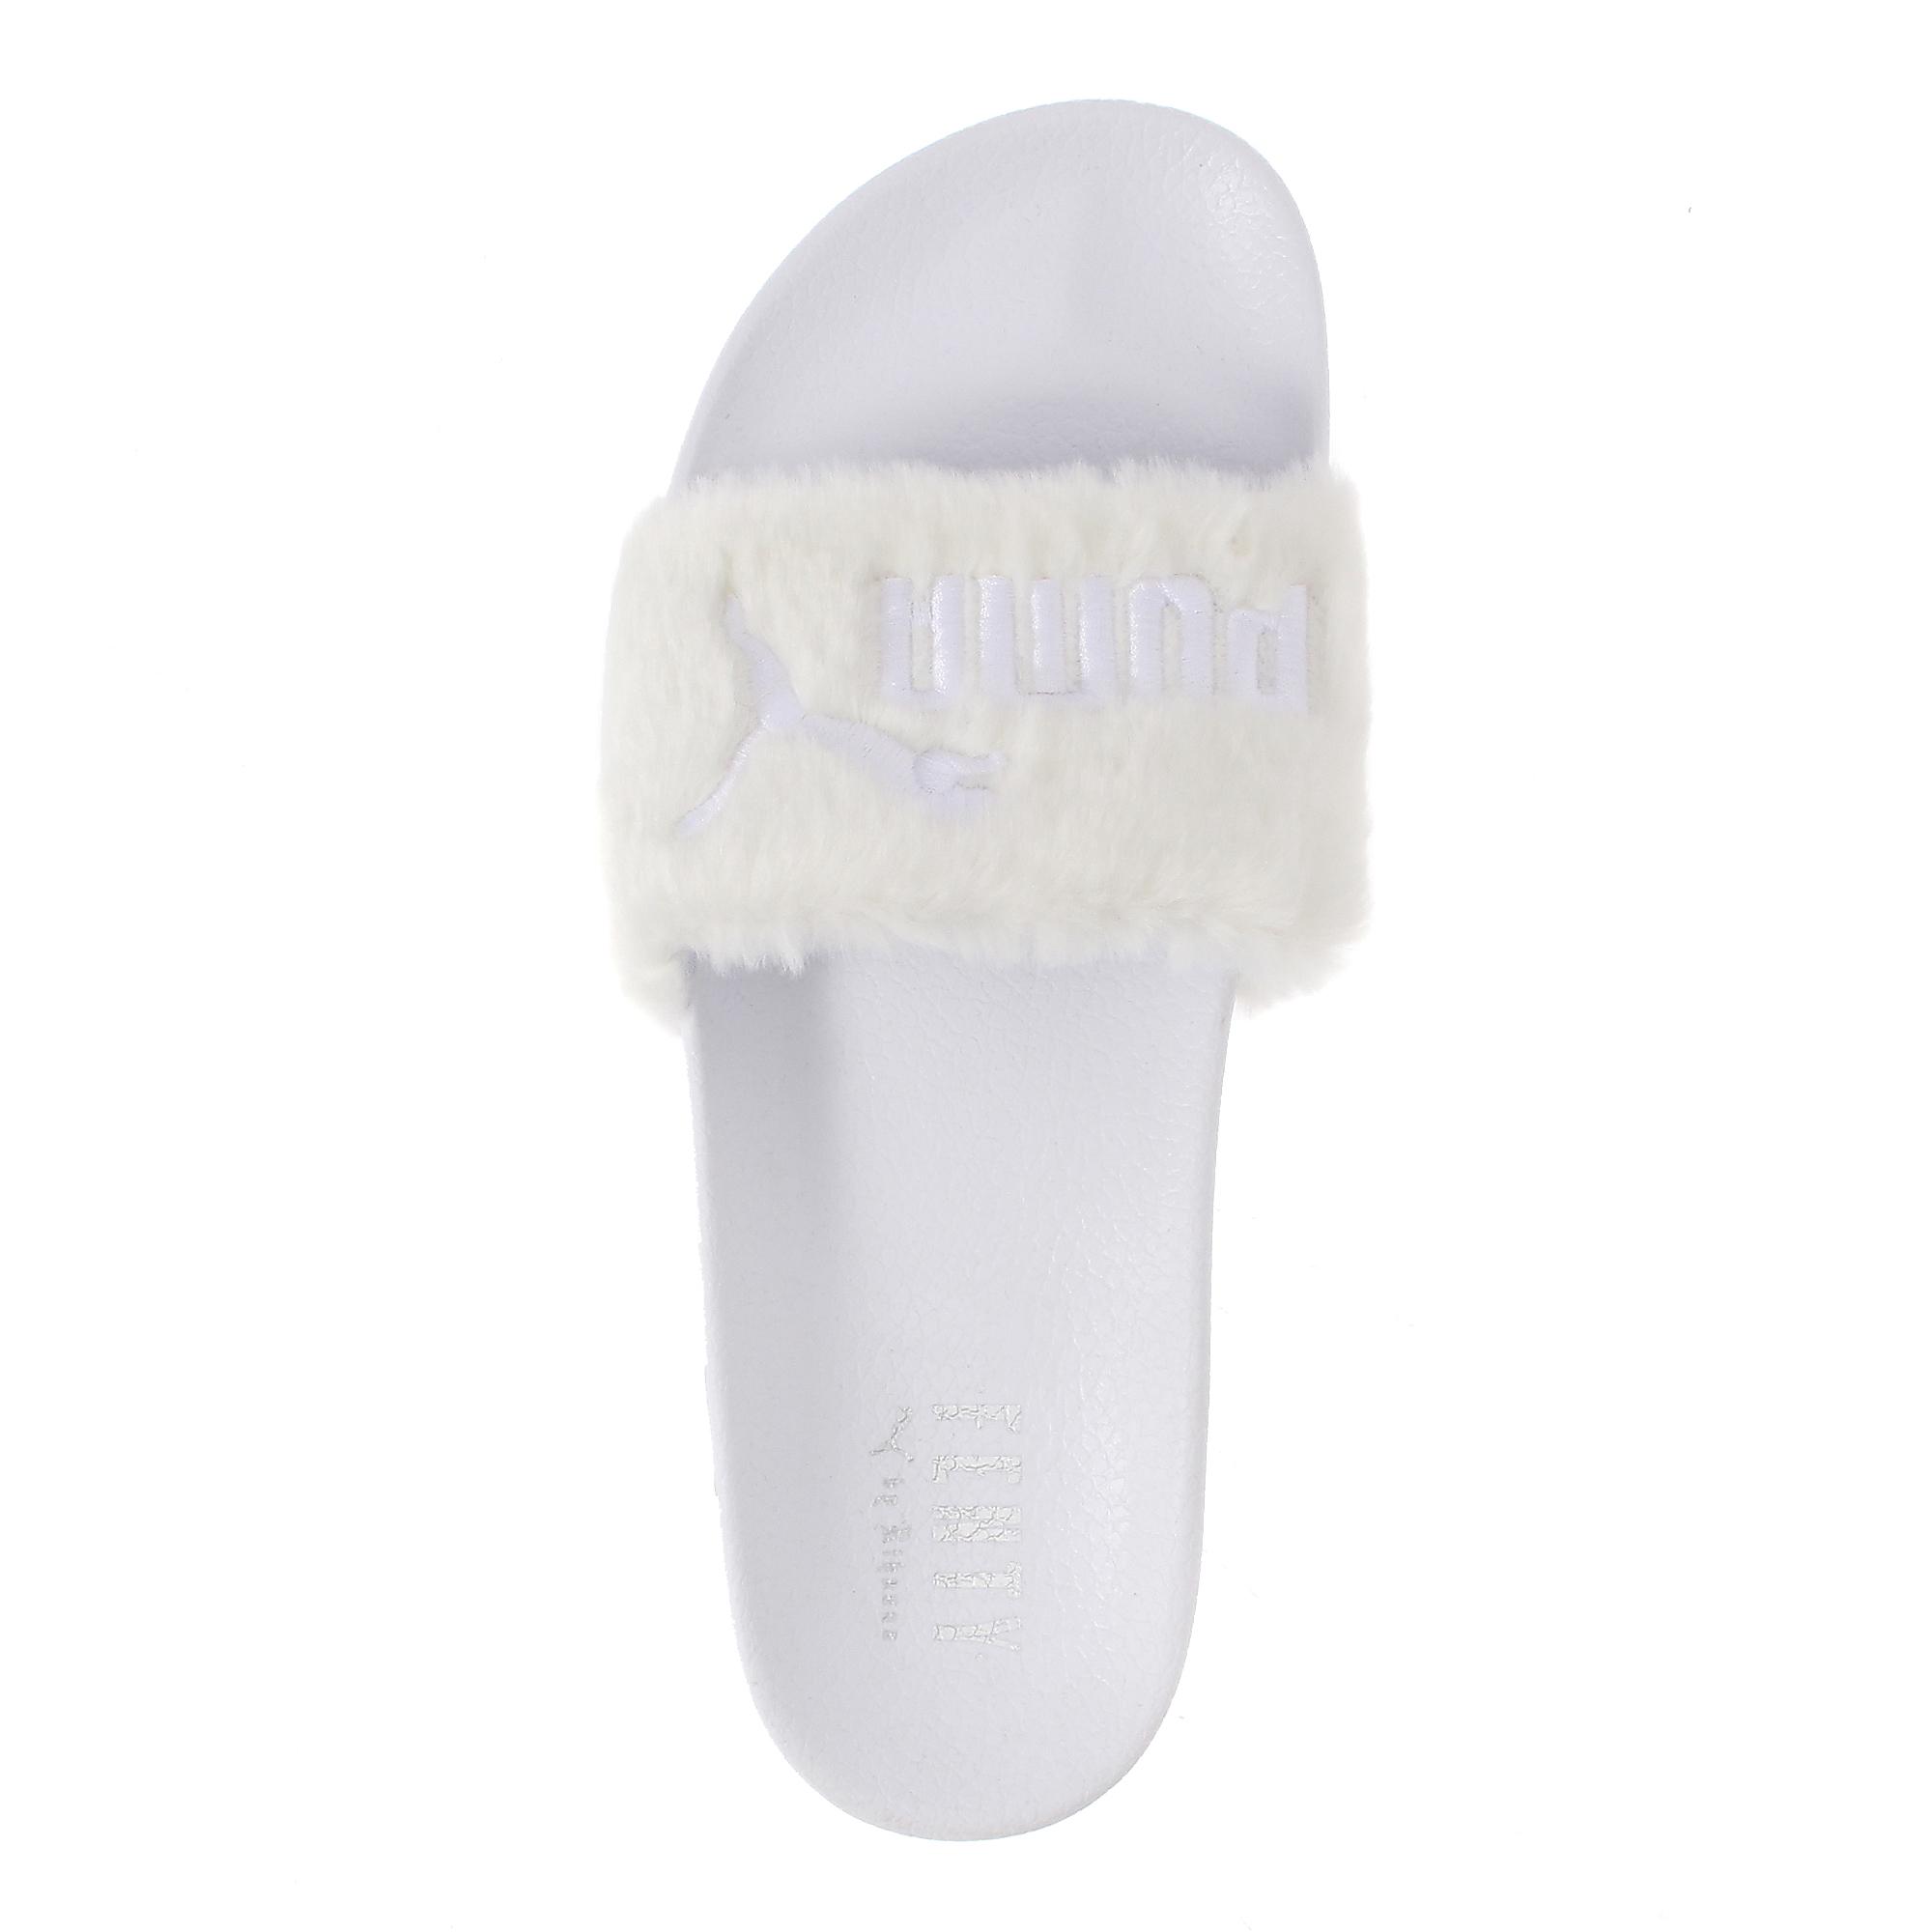 Rihanna Puma Fur Slides  3088328eacc5